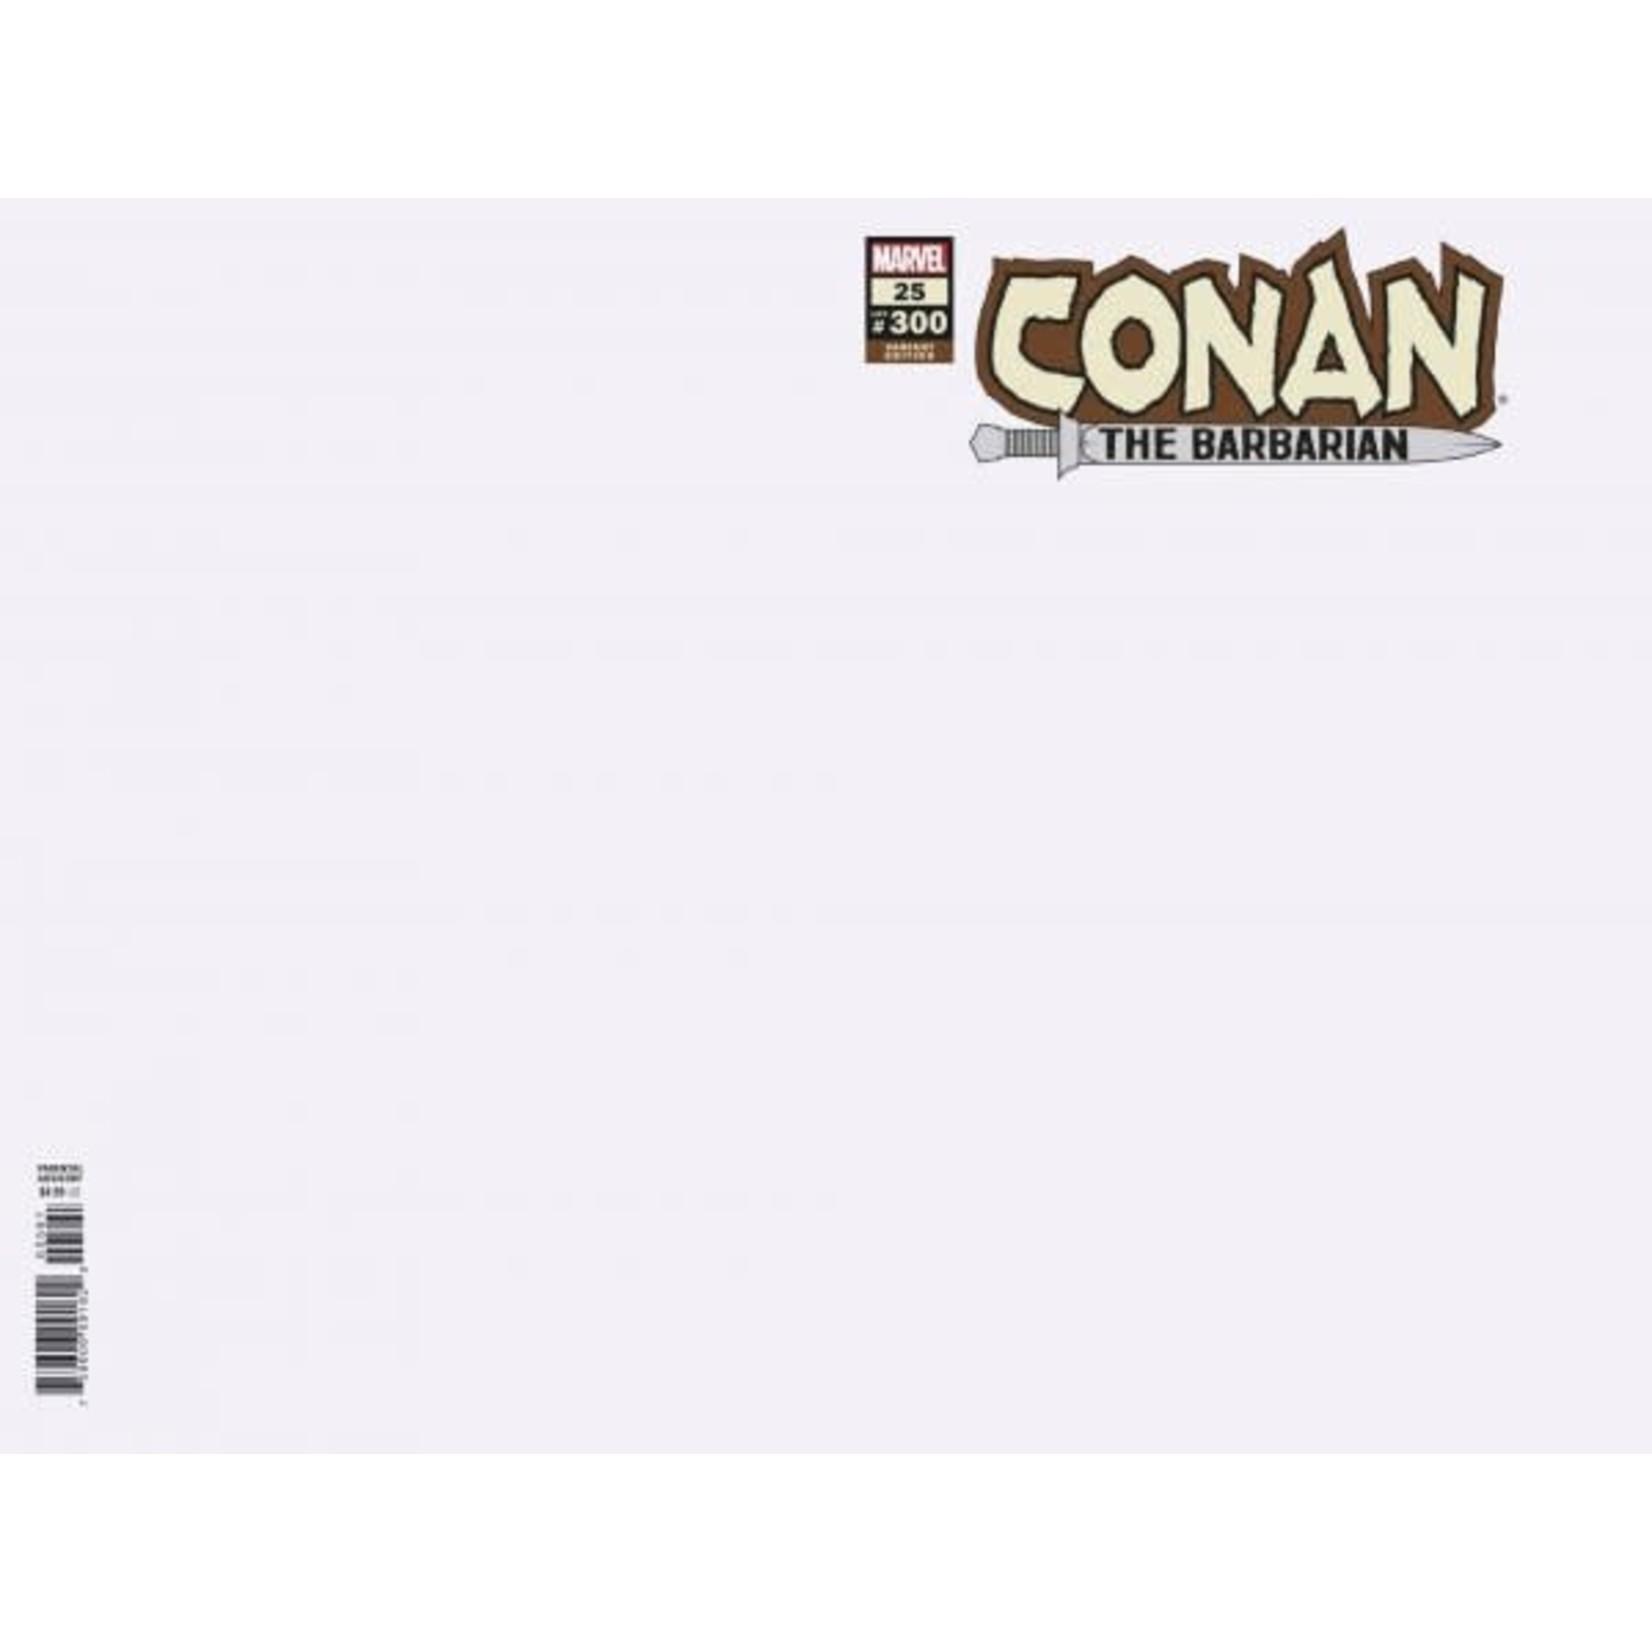 Conan the Barbarian #25 Blank Variant